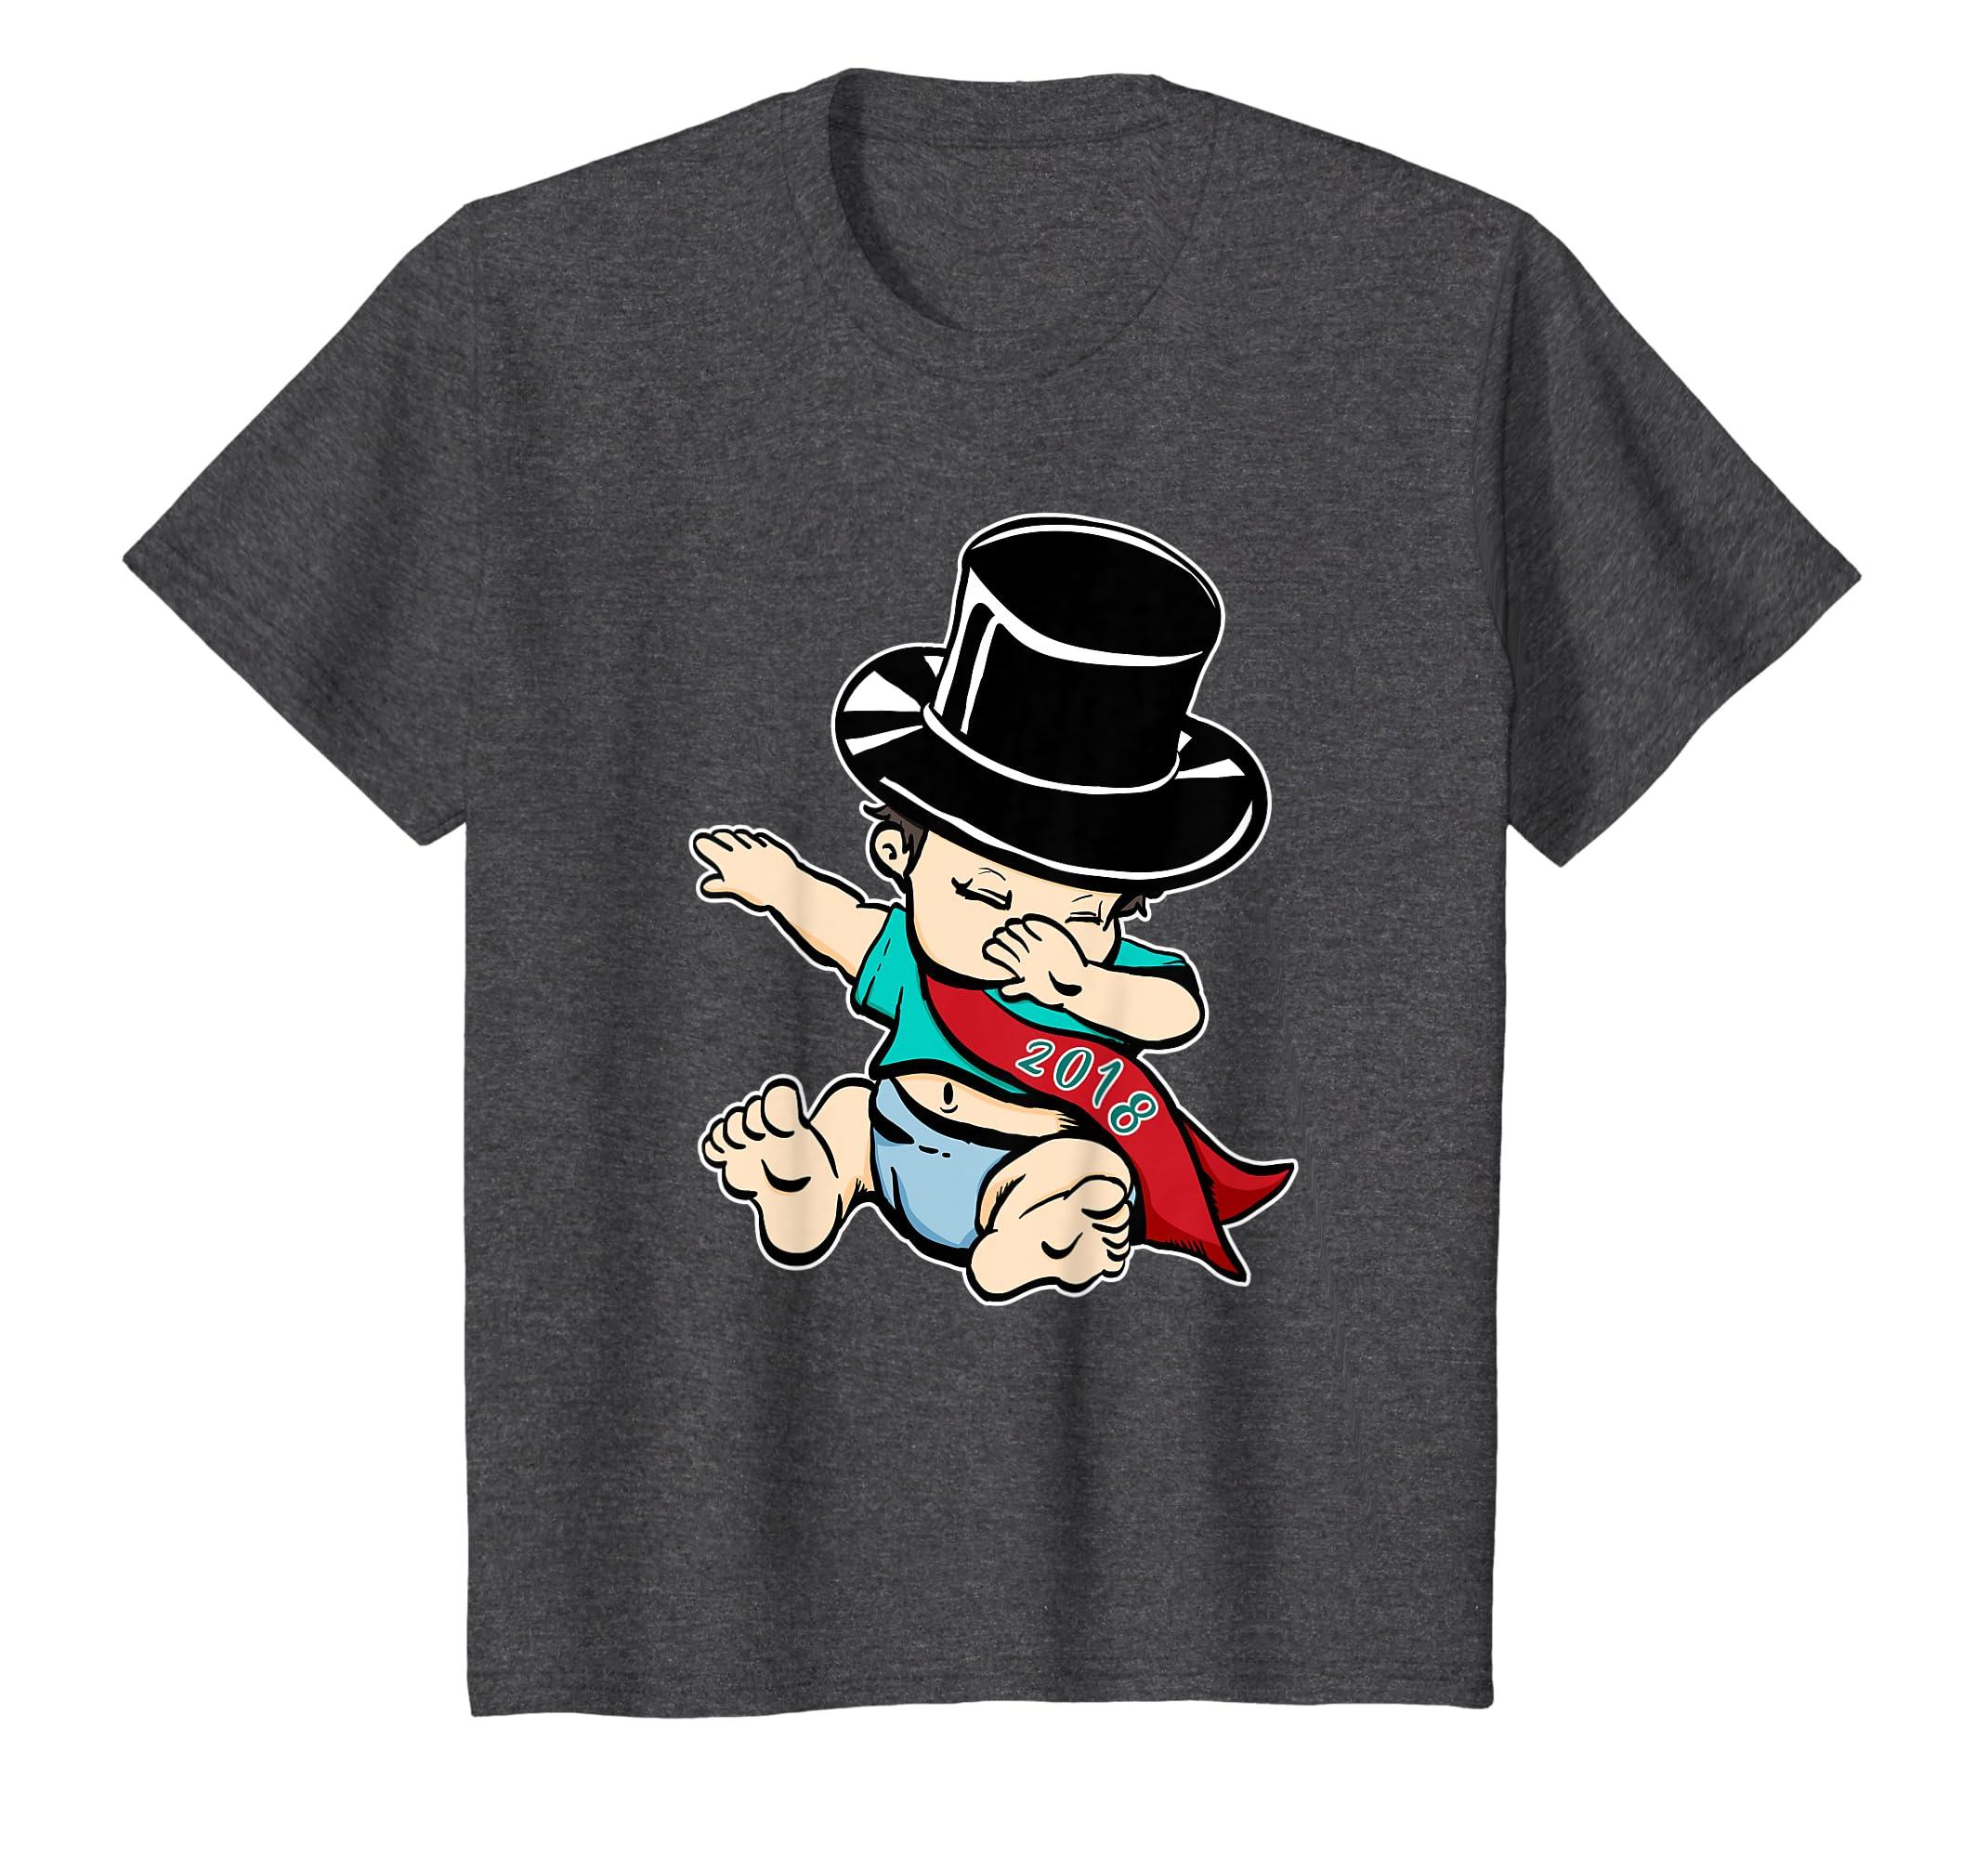 49992cc710 Amazon.com: 2018 New Years Eve Shirt NYE Party Funny Dabbing Baby: Clothing